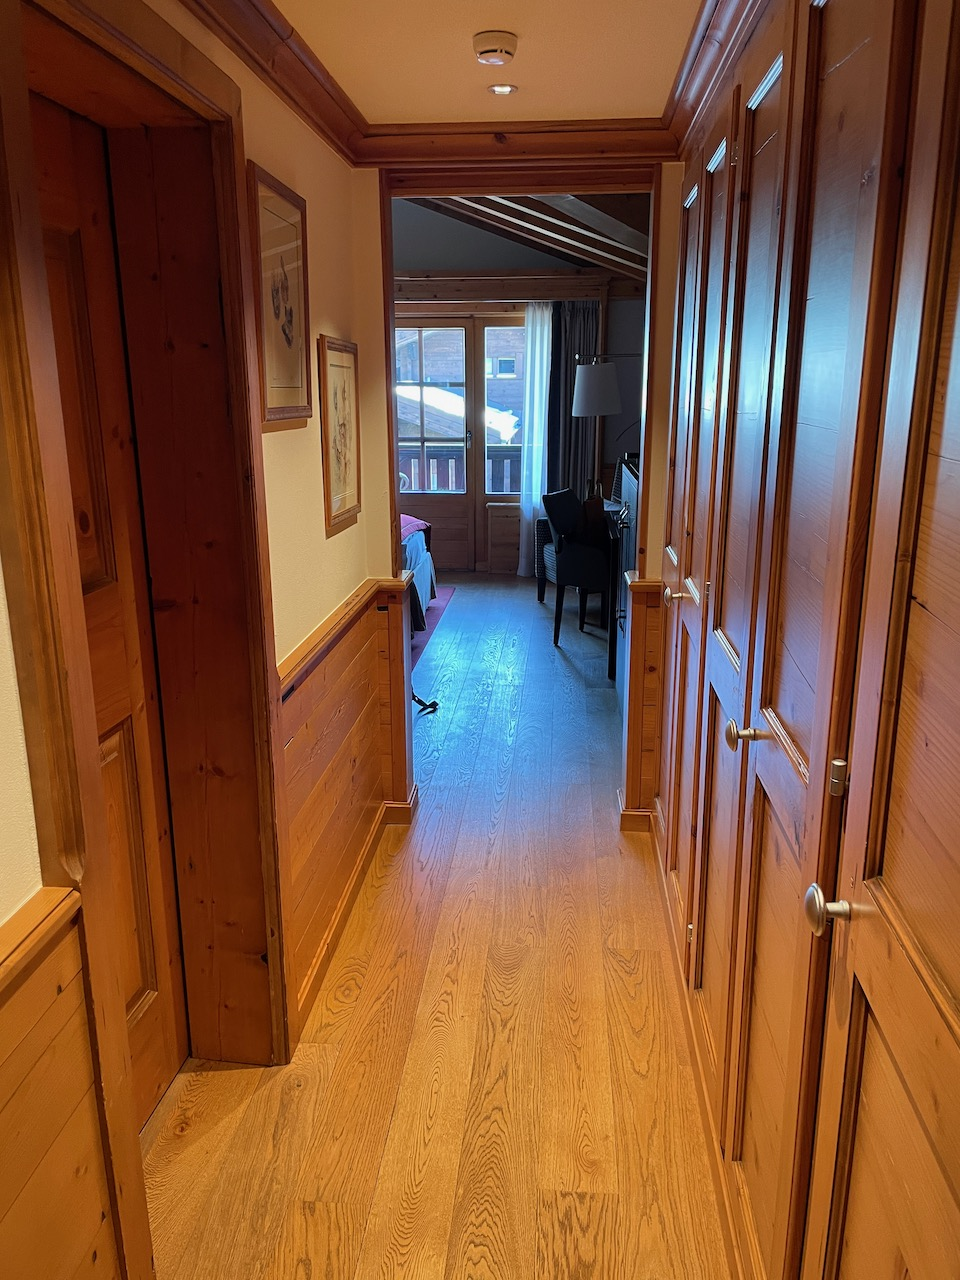 Riffelalp Room 501 Hallway